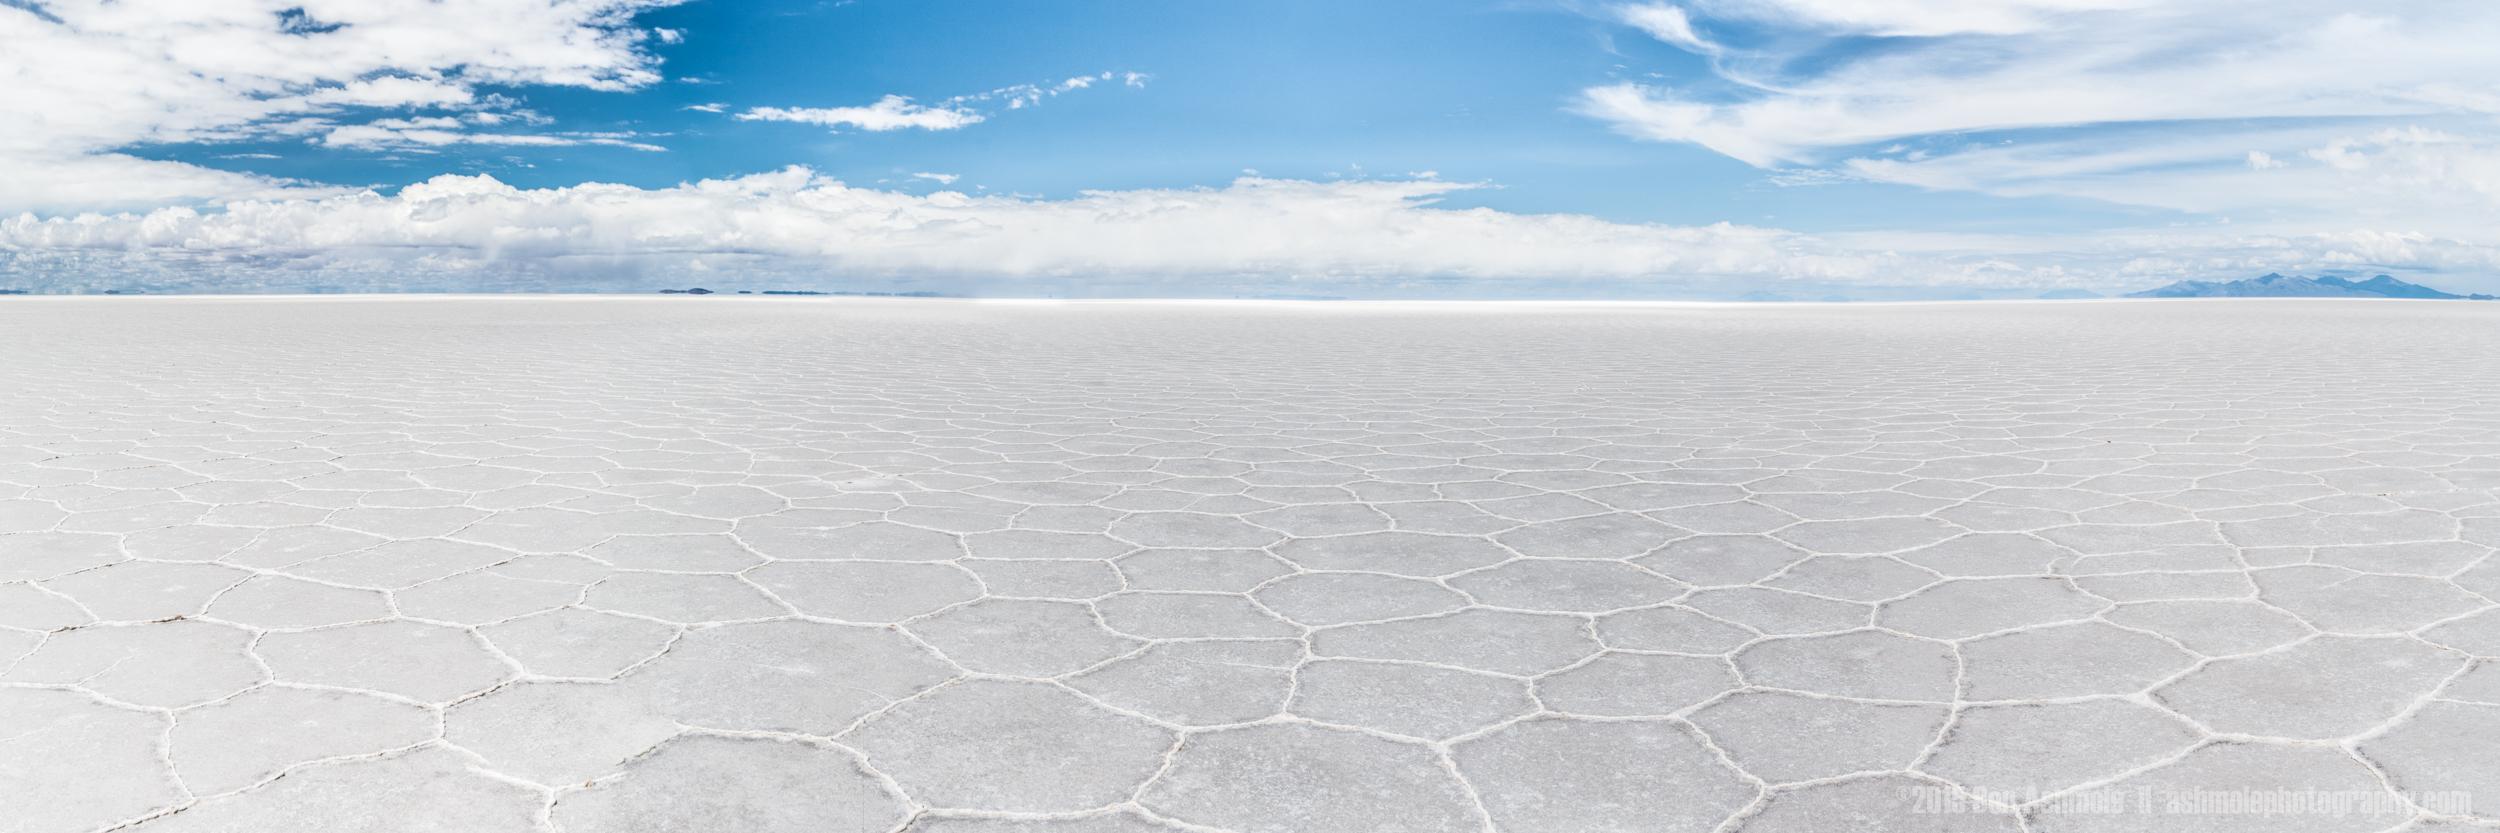 Uyuni Salt Flat Panorama, Bolivia